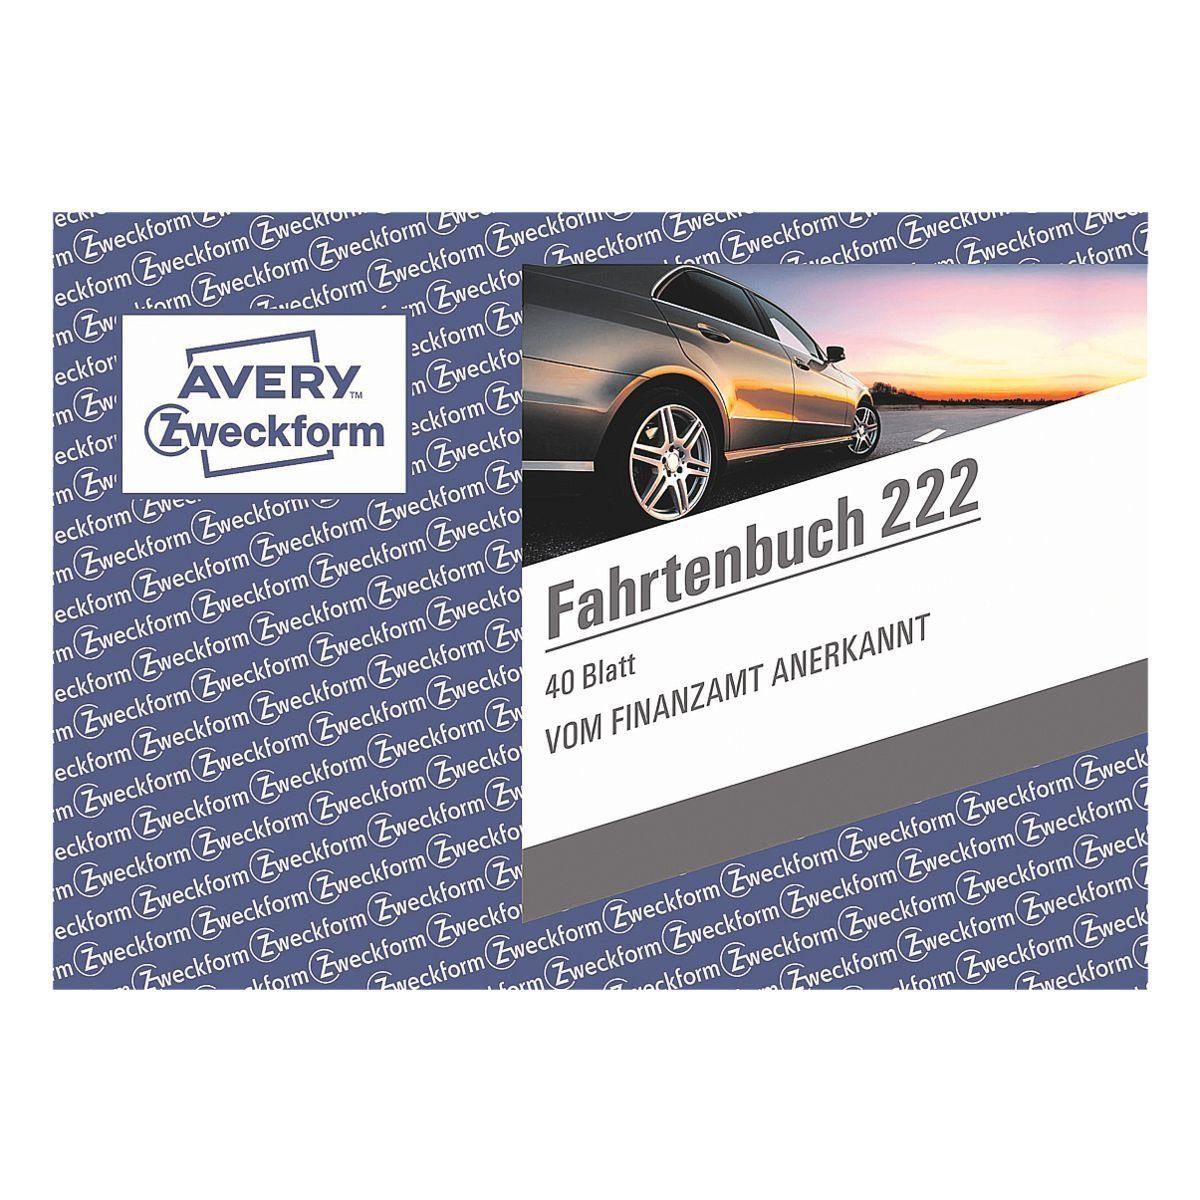 Avery Zweckform Formularbuch »Fahrtenbuch 222«